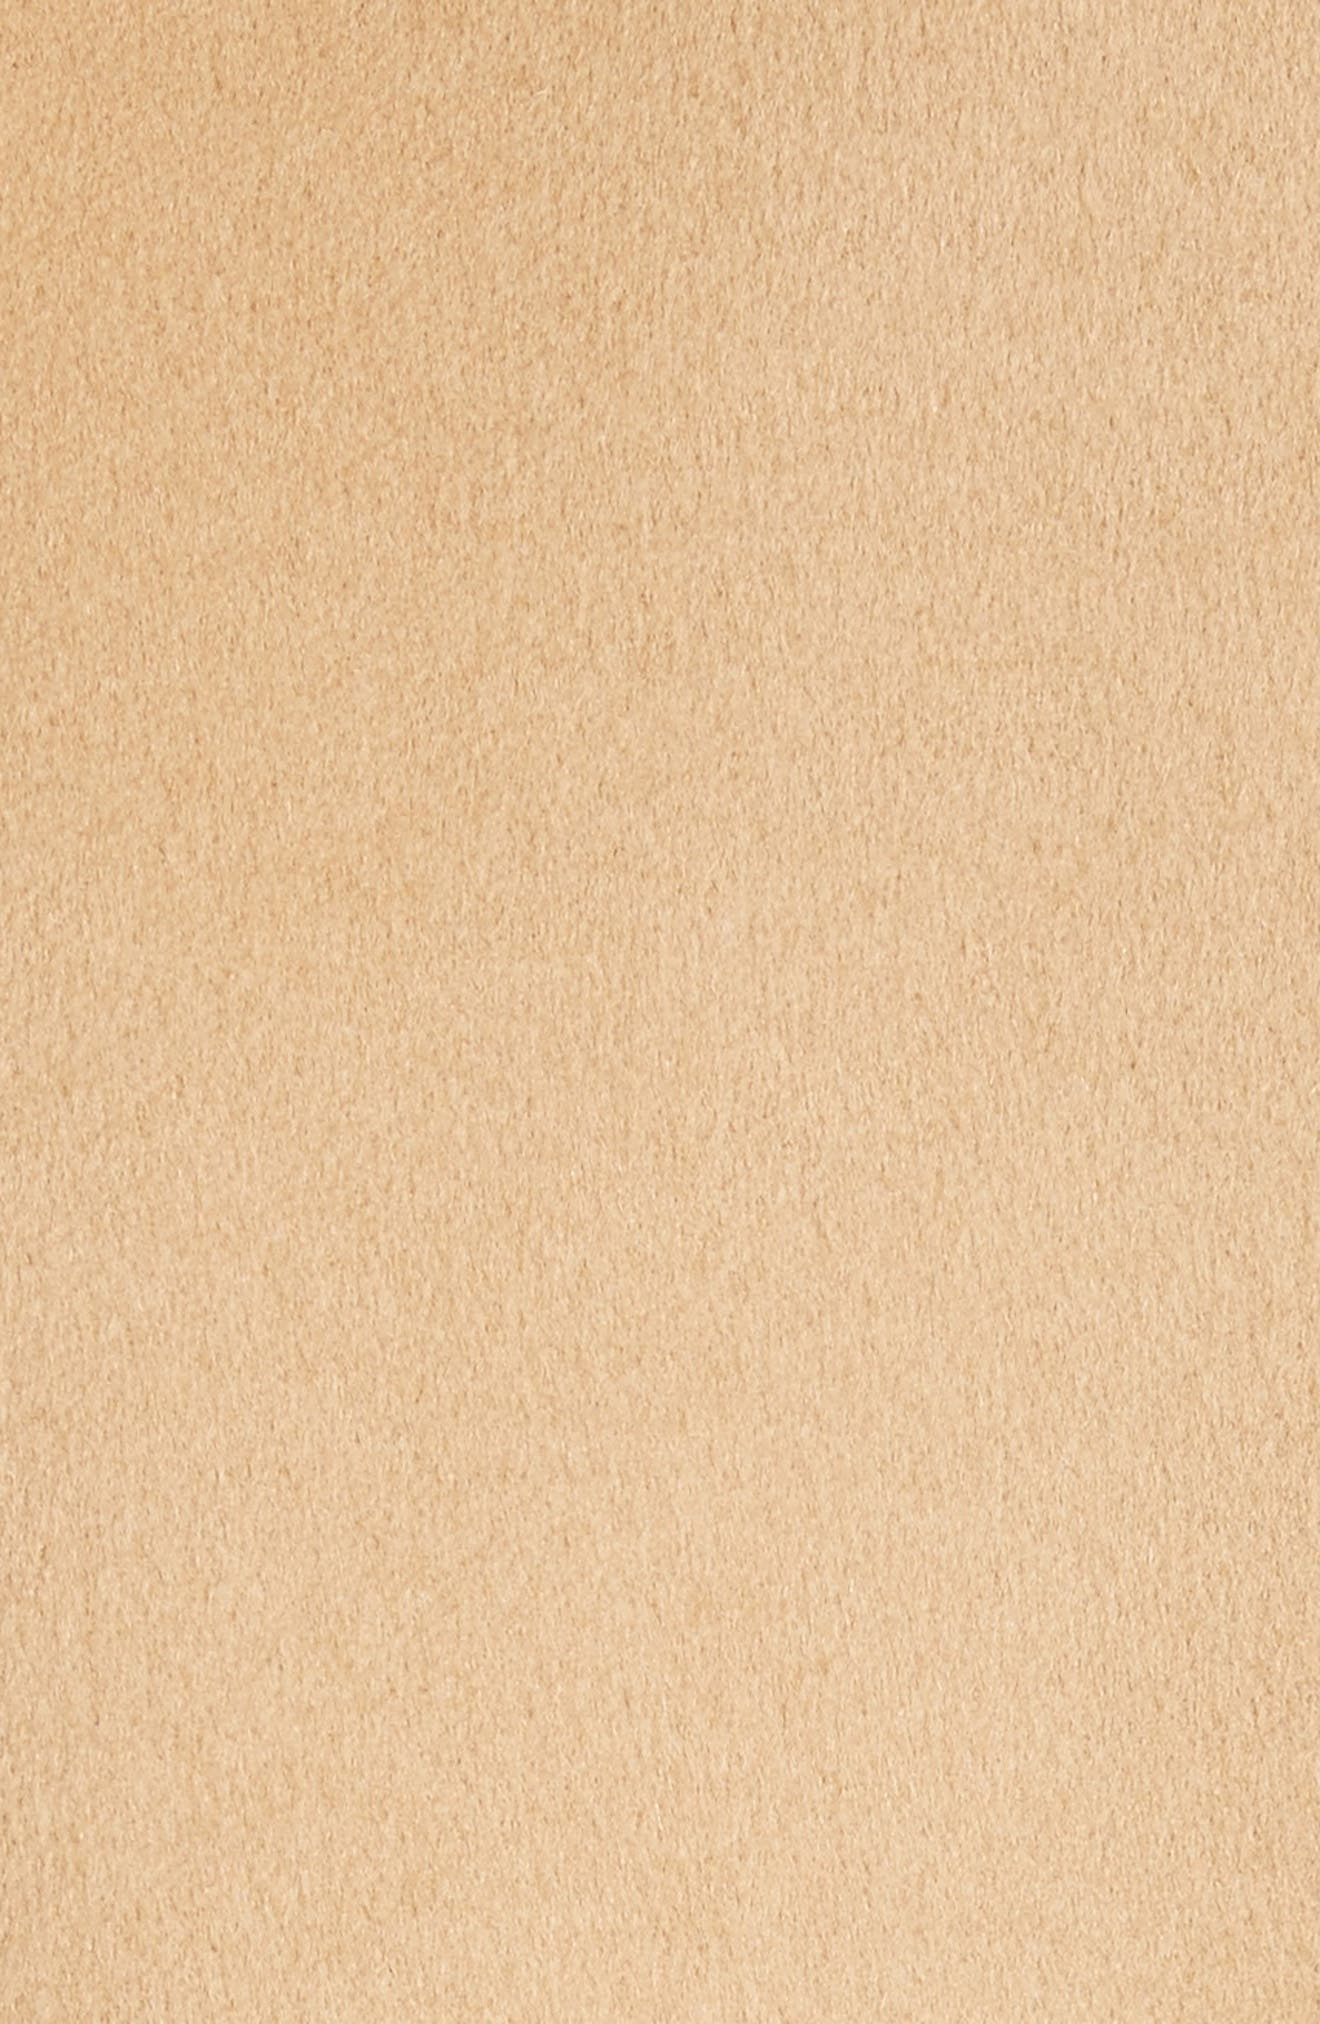 Alternate Image 3  - Michael Kors Wool Blend Coat